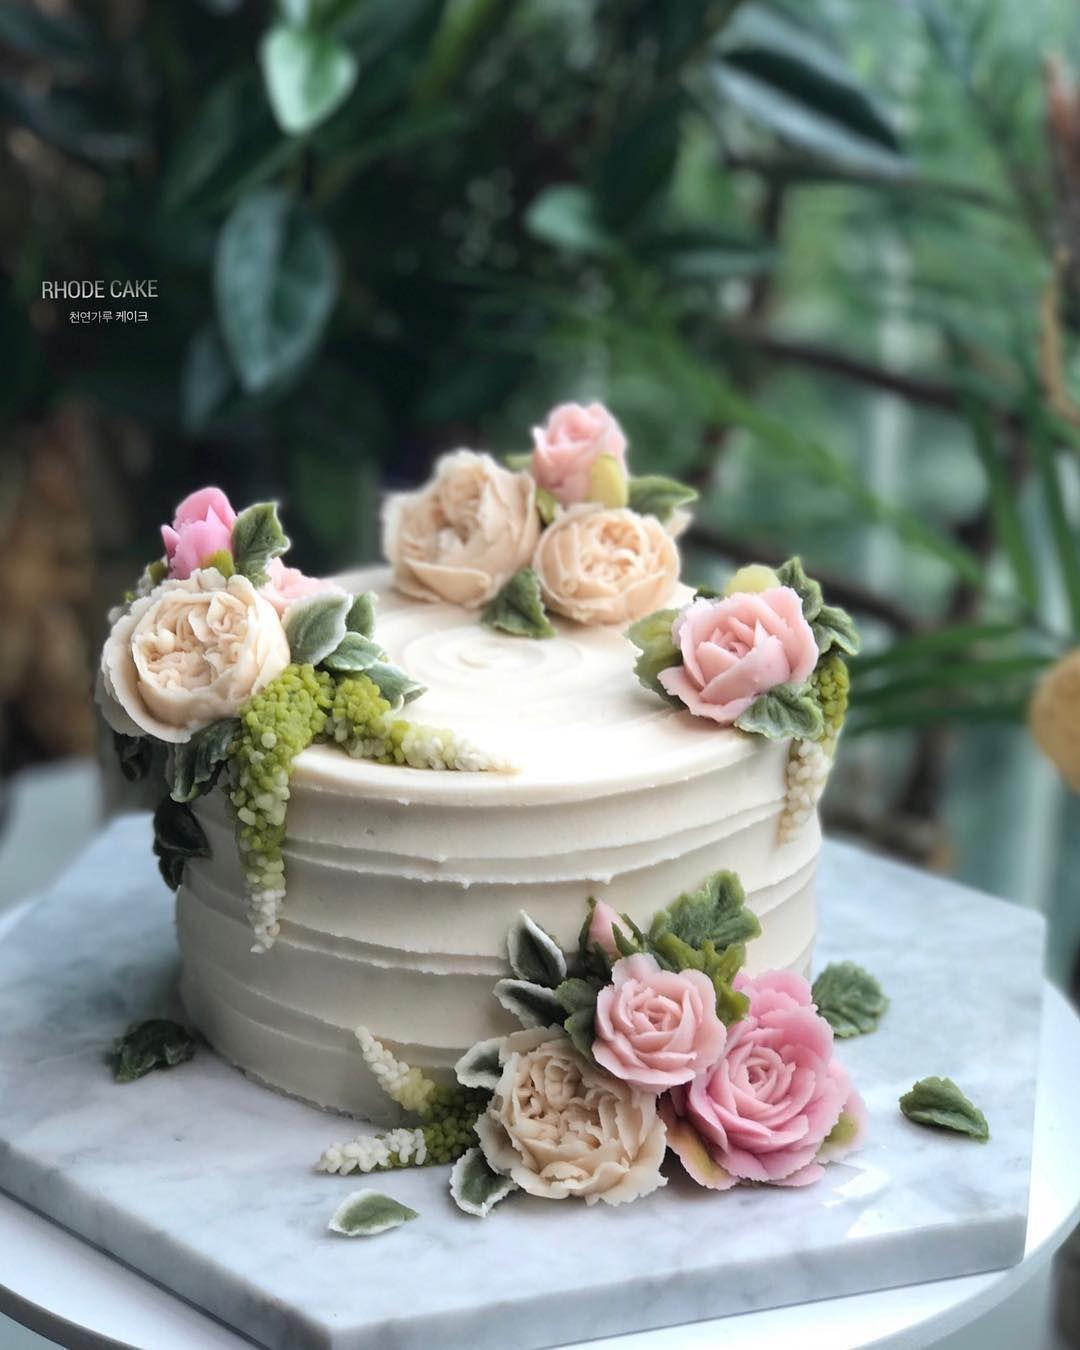 Korean wedding decoration ideas  로데플라워케이크 정규 심화 꽃반 클래스 TALK ID  sun